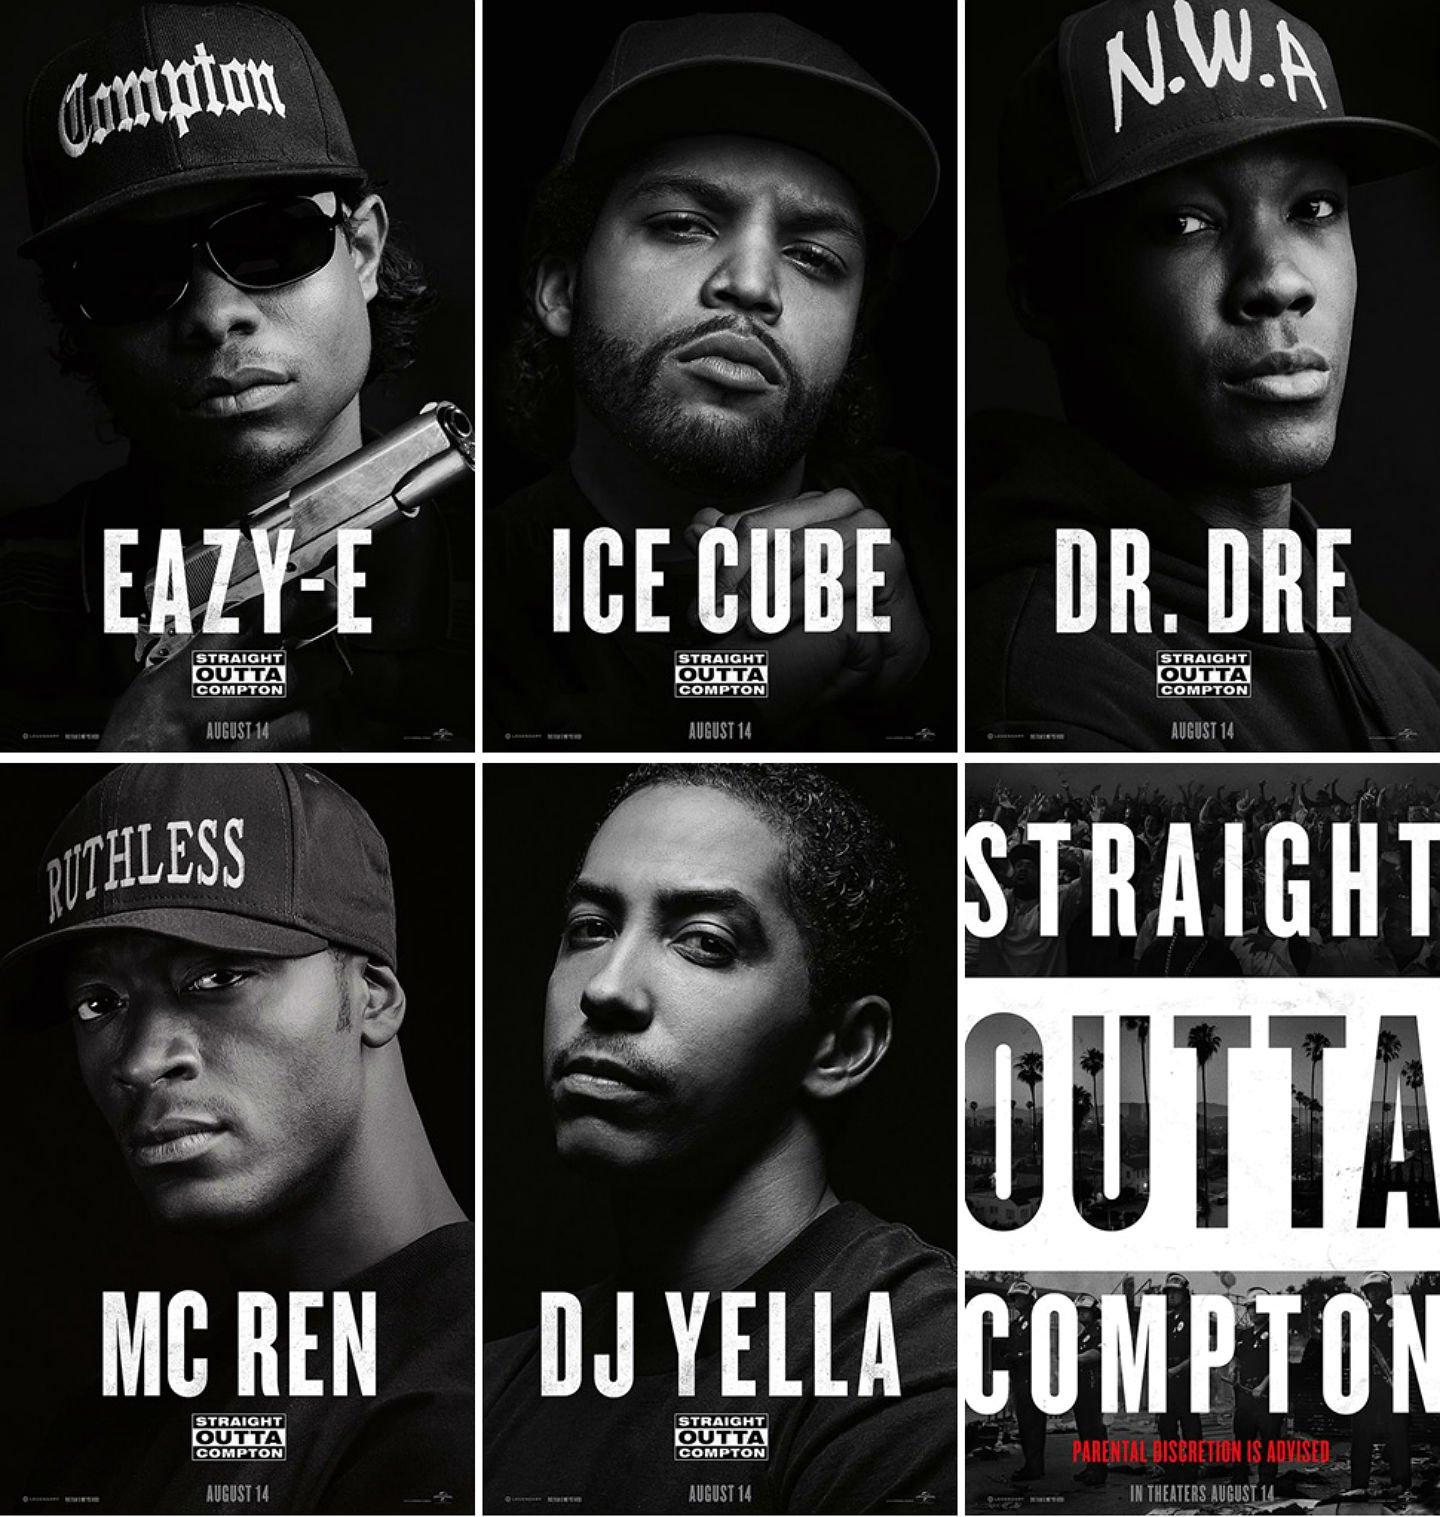 hop gangsta nwa biography drama music 1soc poster wallpaper background 1440x1517